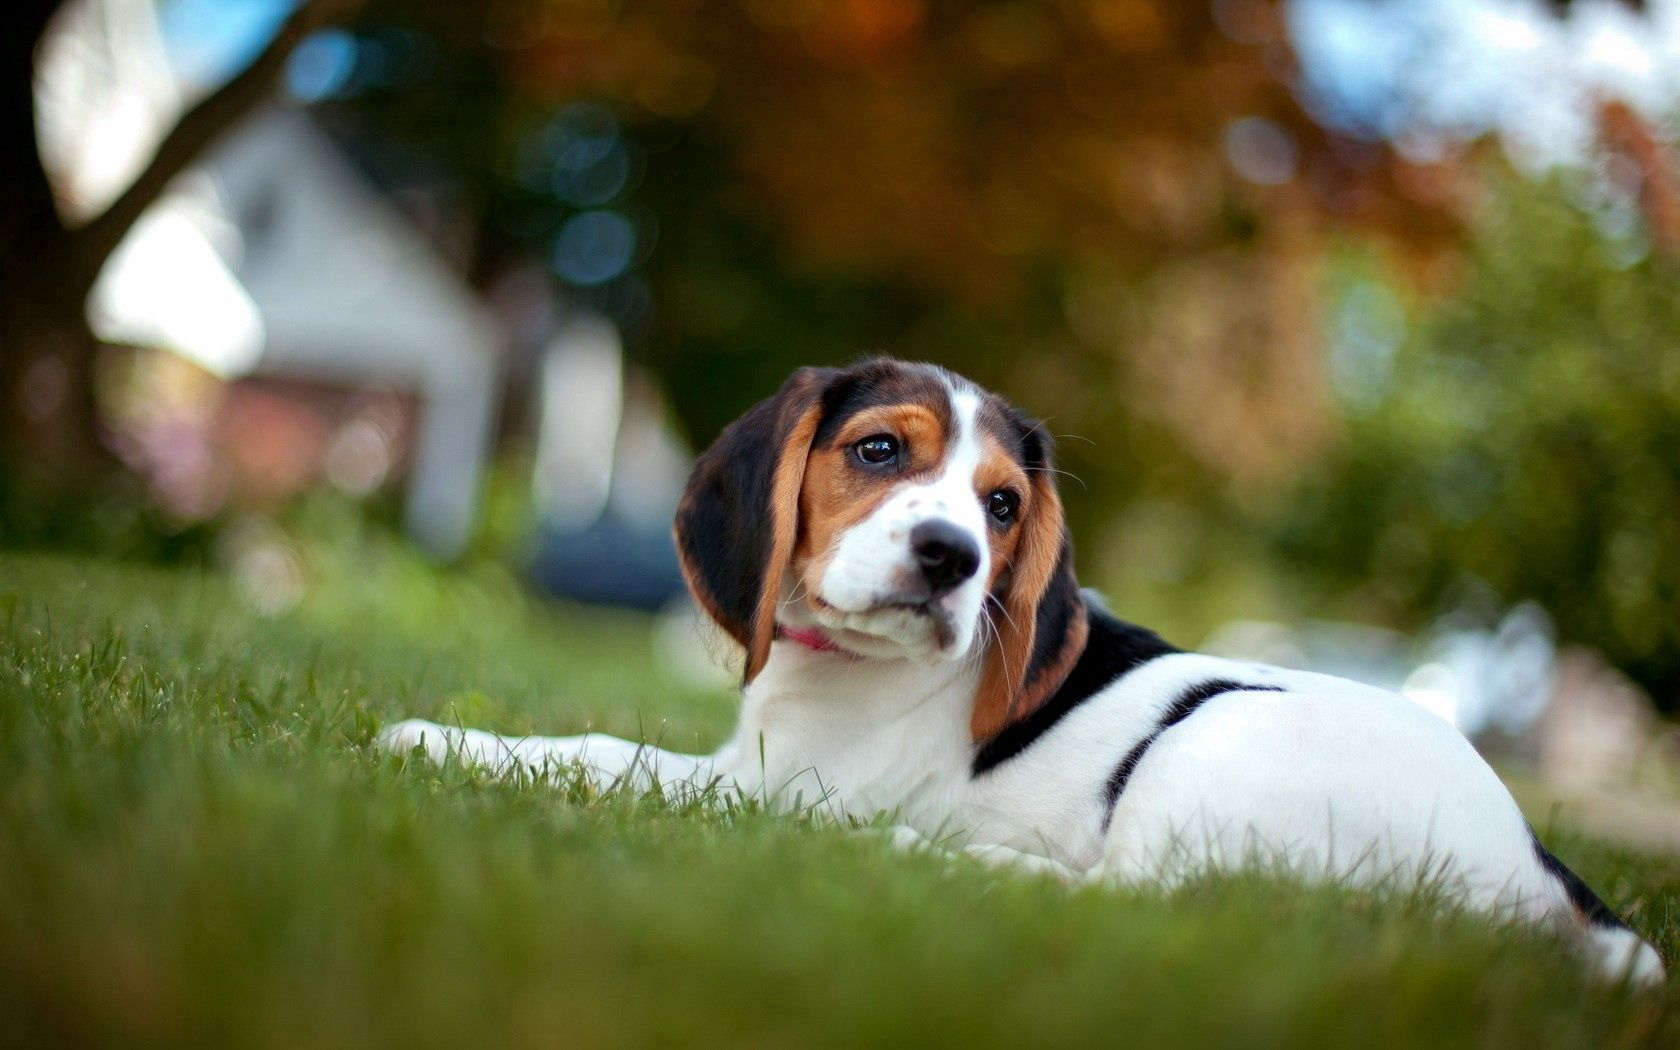 57044 descargar fondo de pantalla Animales, Cachorro, Hierba, Tumbarse, Mentir, Color: protectores de pantalla e imágenes gratis